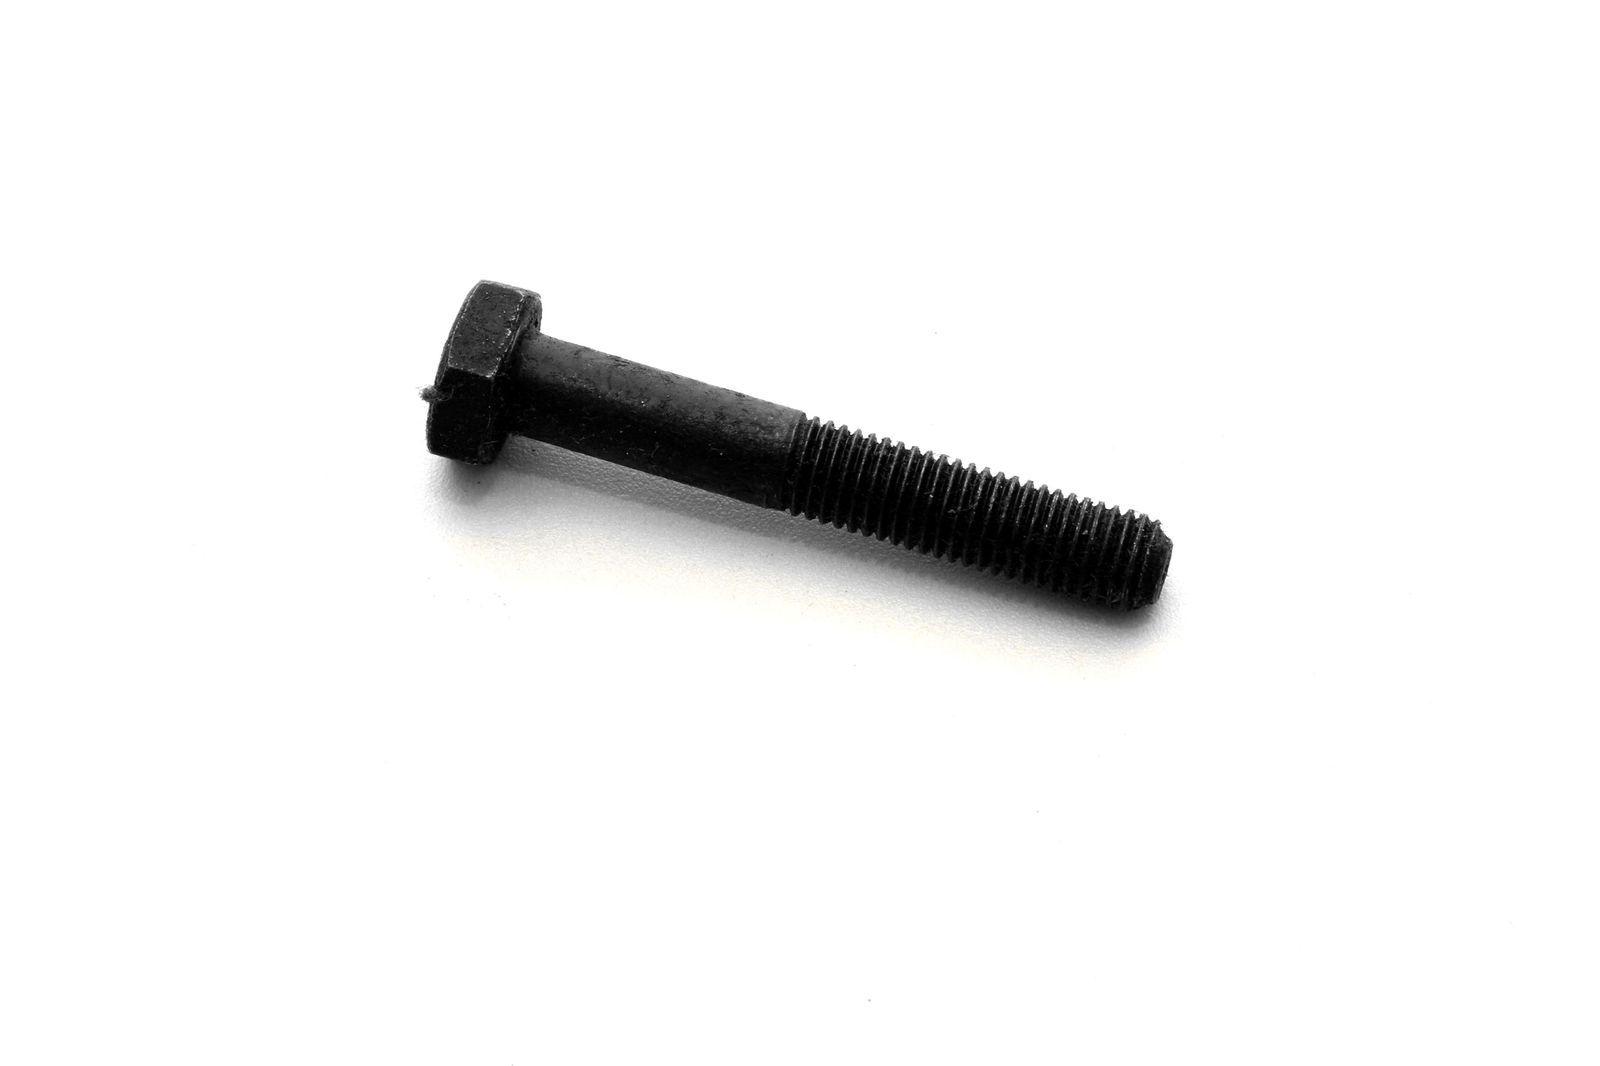 "#1002-05 Bolzen UNF 1/4"" x 1 5/8"", BH604131"